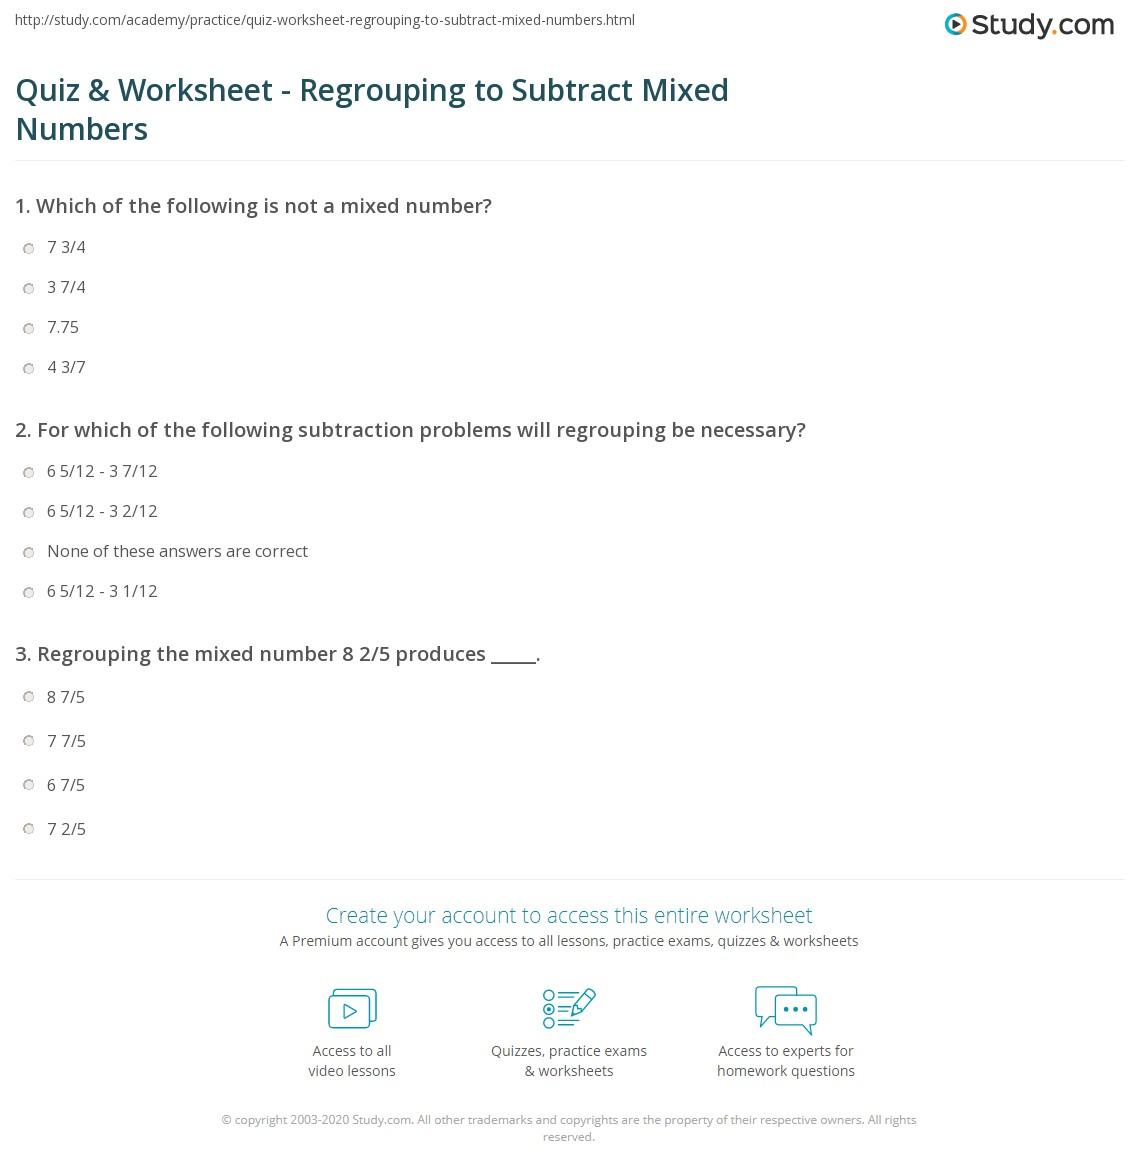 worksheet Subtracting Mixed Numbers Worksheets quiz worksheet regrouping to subtract mixed numbers study com print subtracting with worksheet